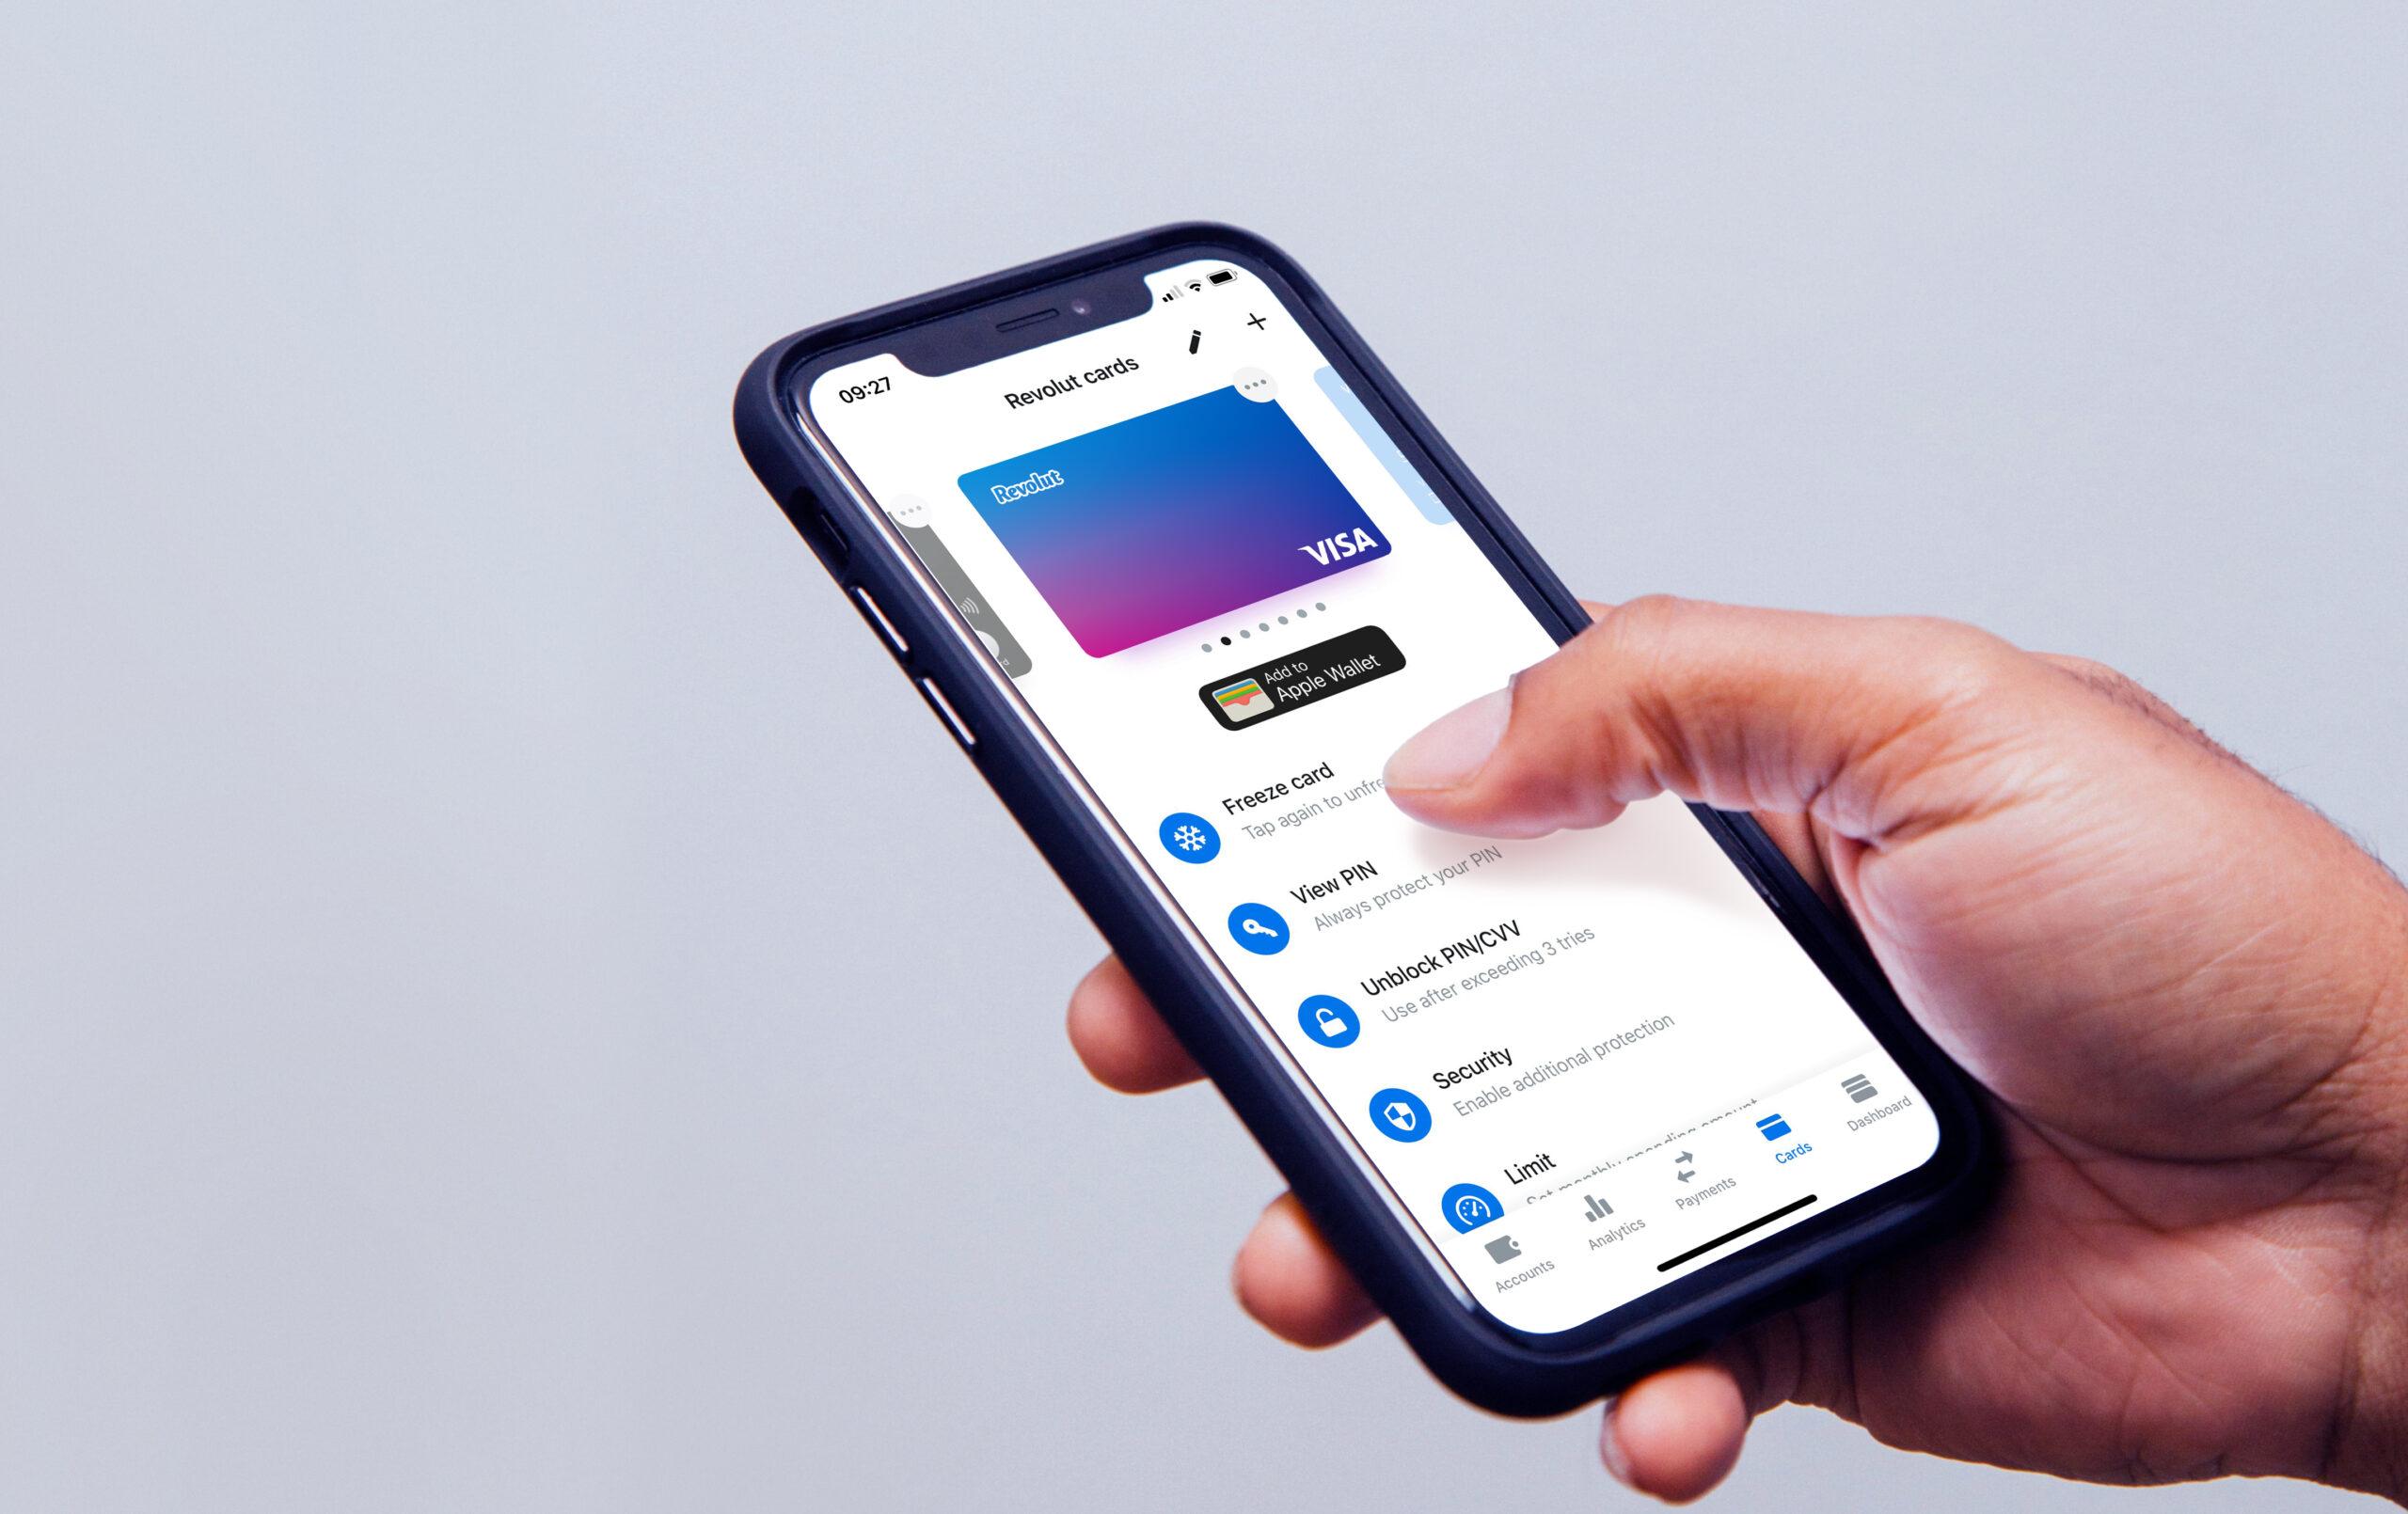 Mobile phone displaying Revolut app